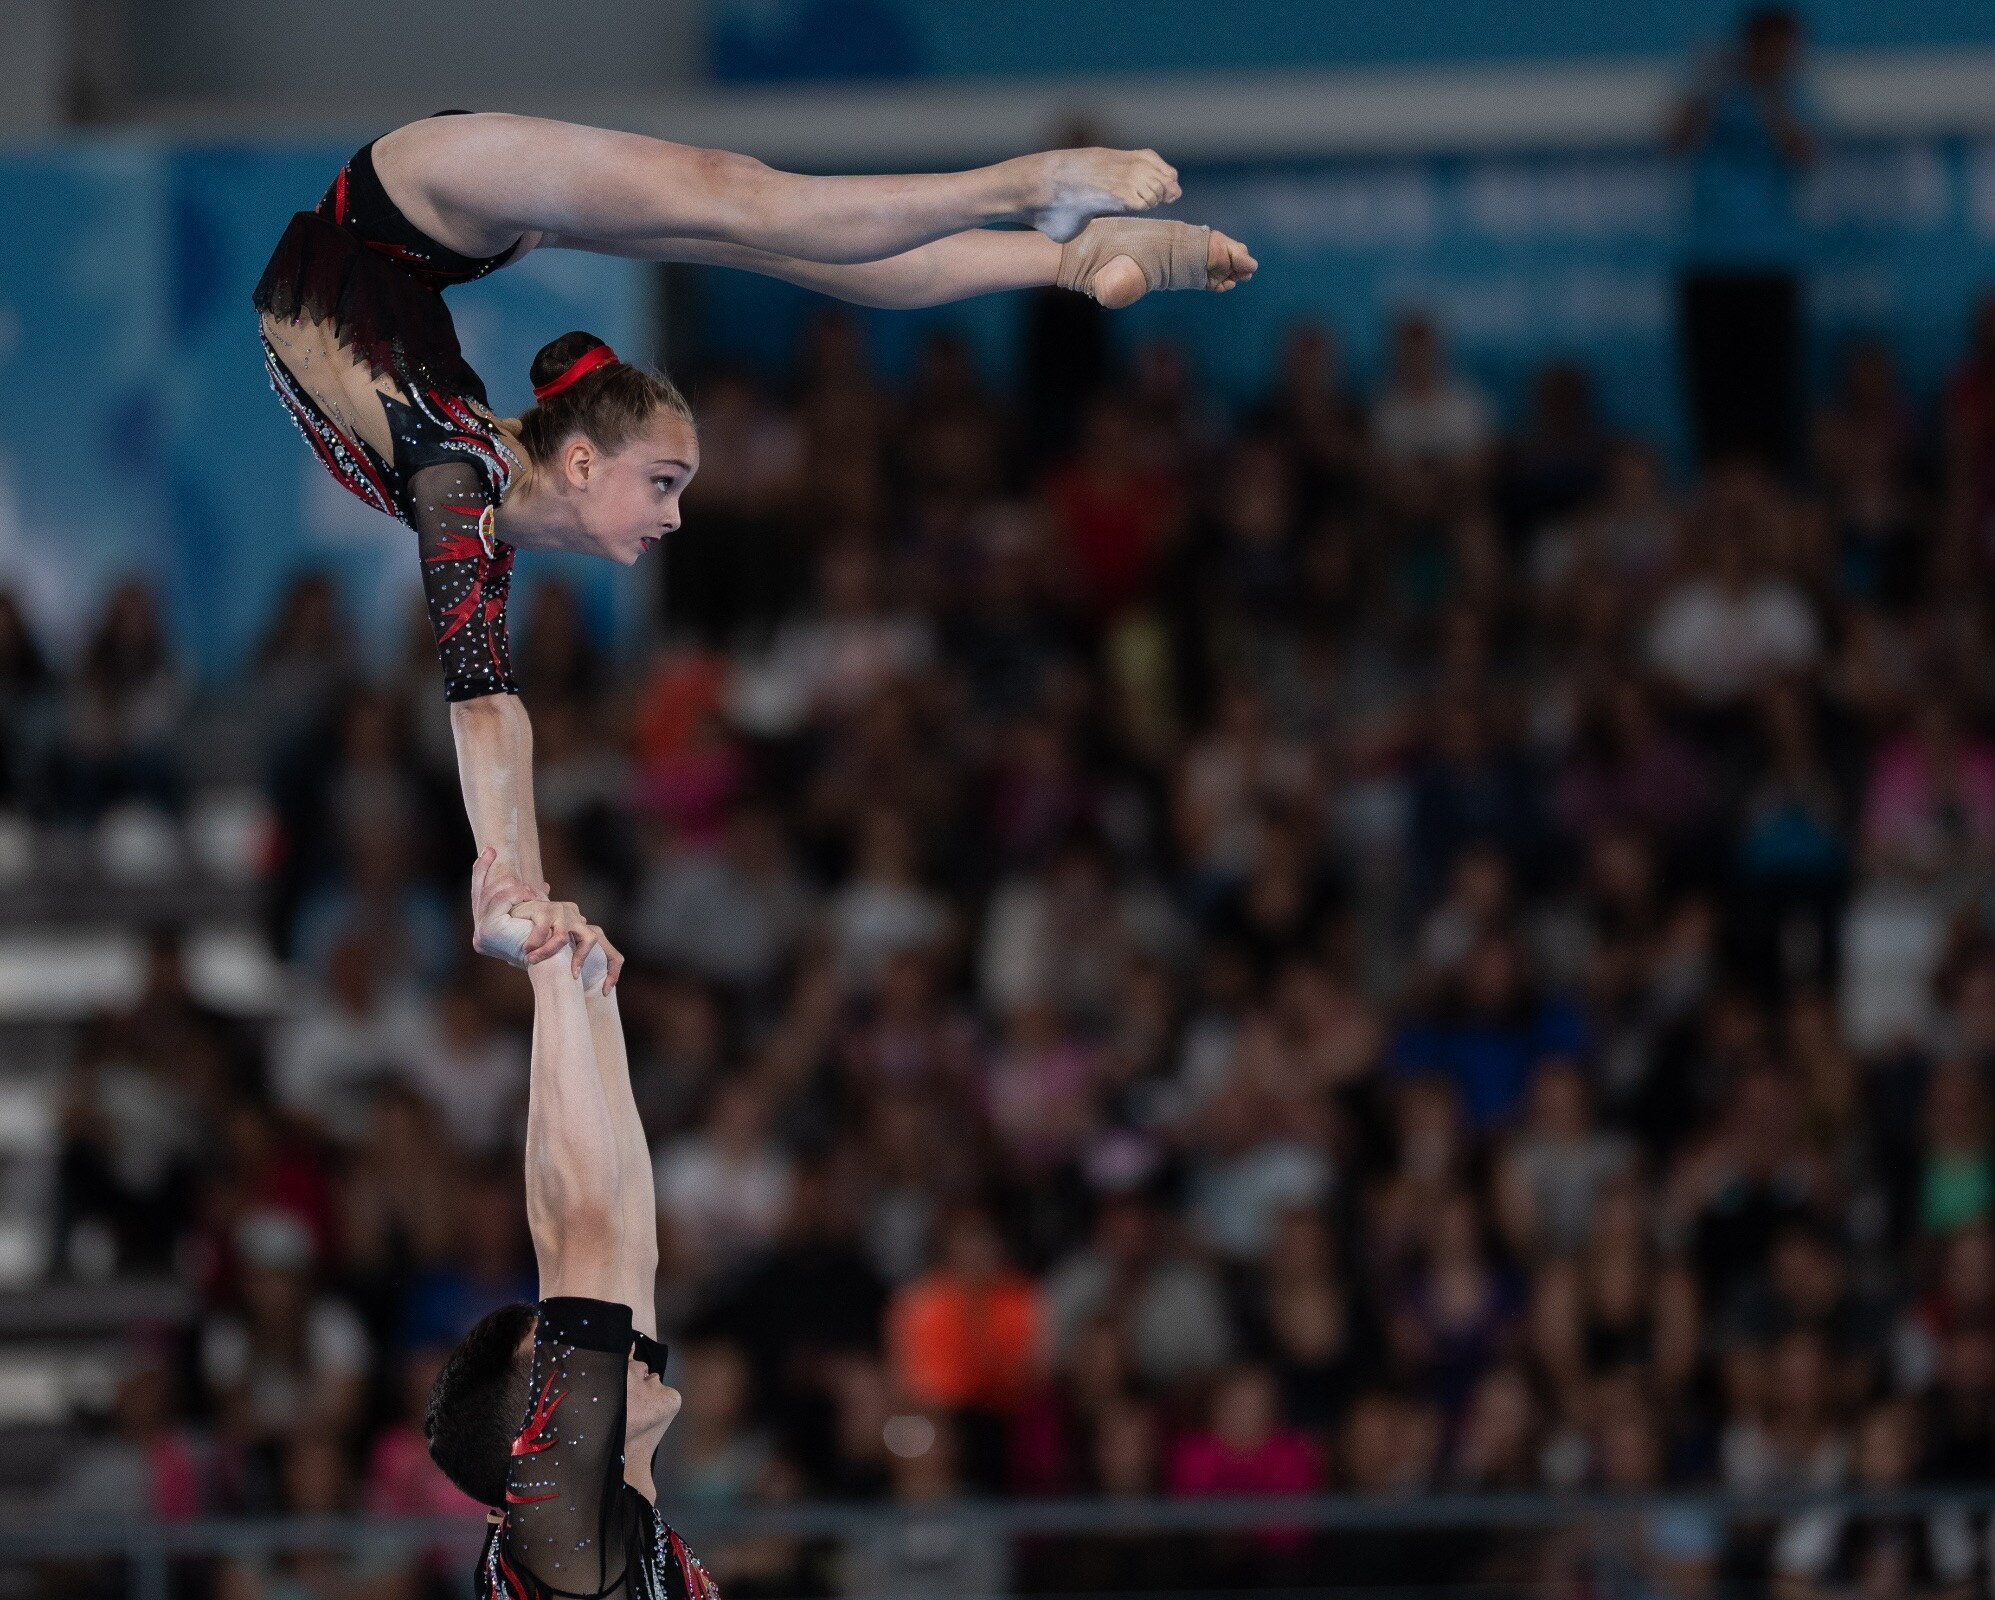 Buenos Aires 2018 - Acrobatic Gymnastics - Mixed Pair